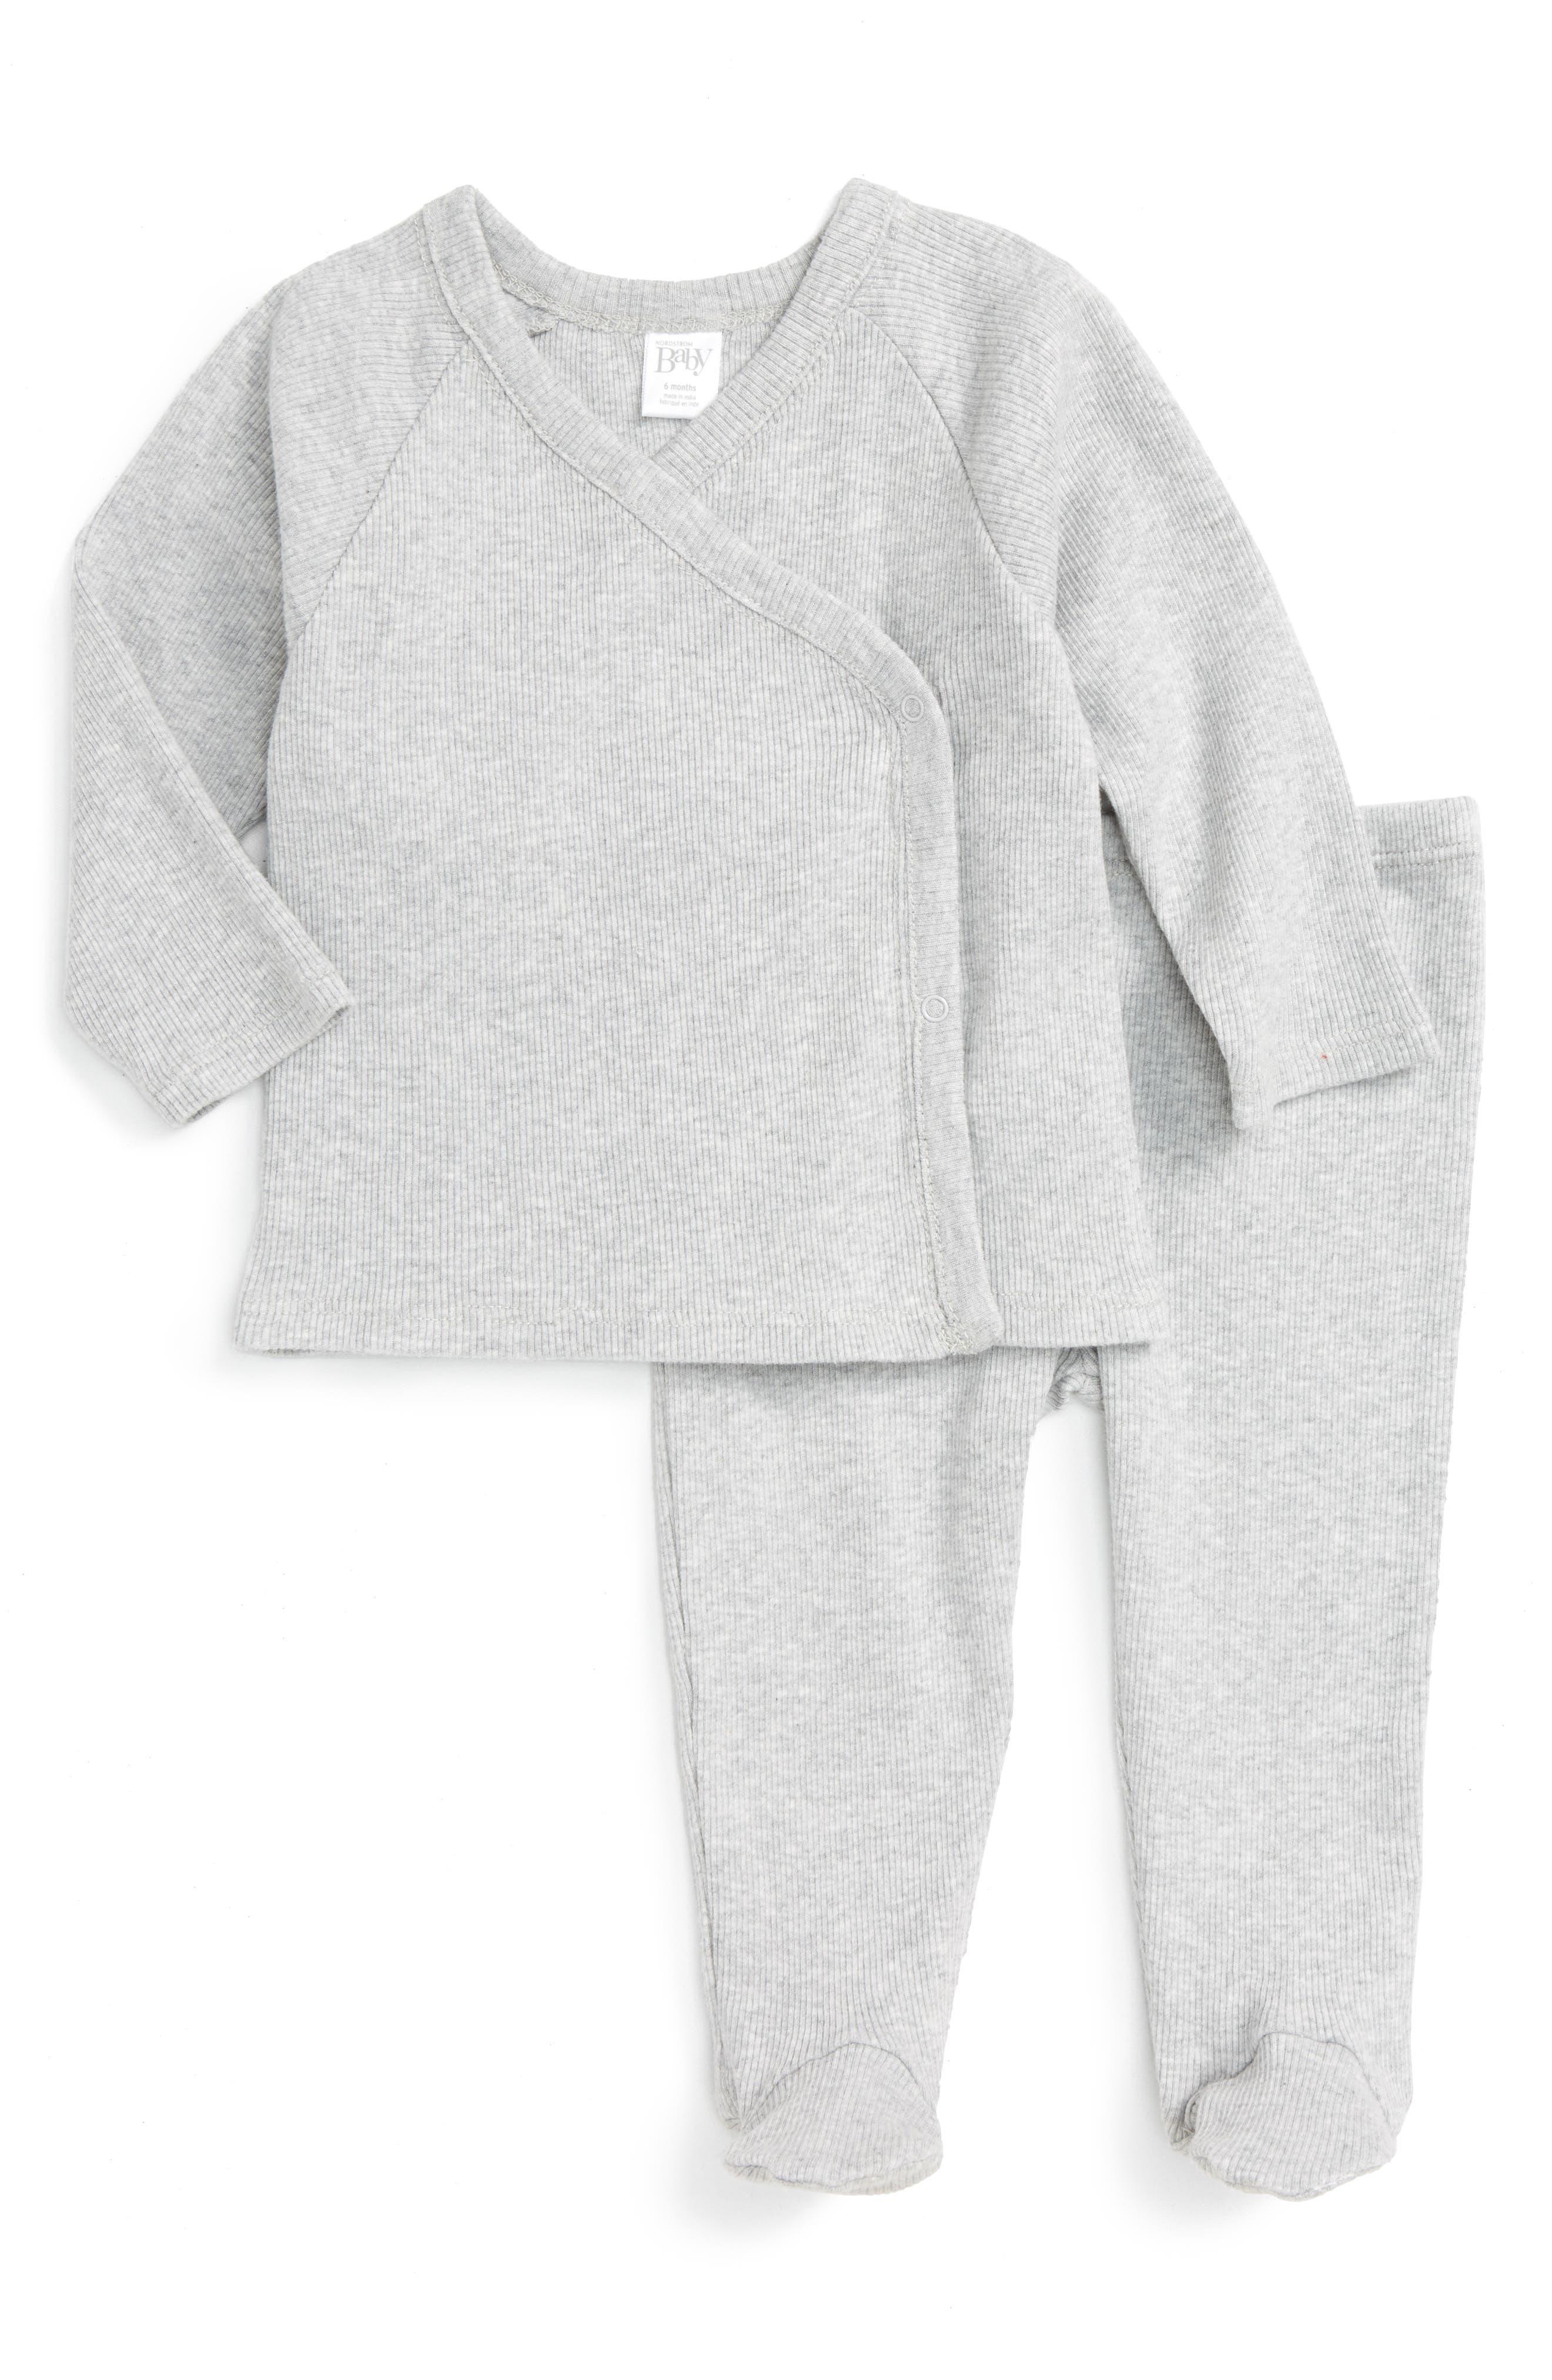 Rib Knit T-Shirt & Pants Set,                             Alternate thumbnail 2, color,                             GREY ASH HEATHER